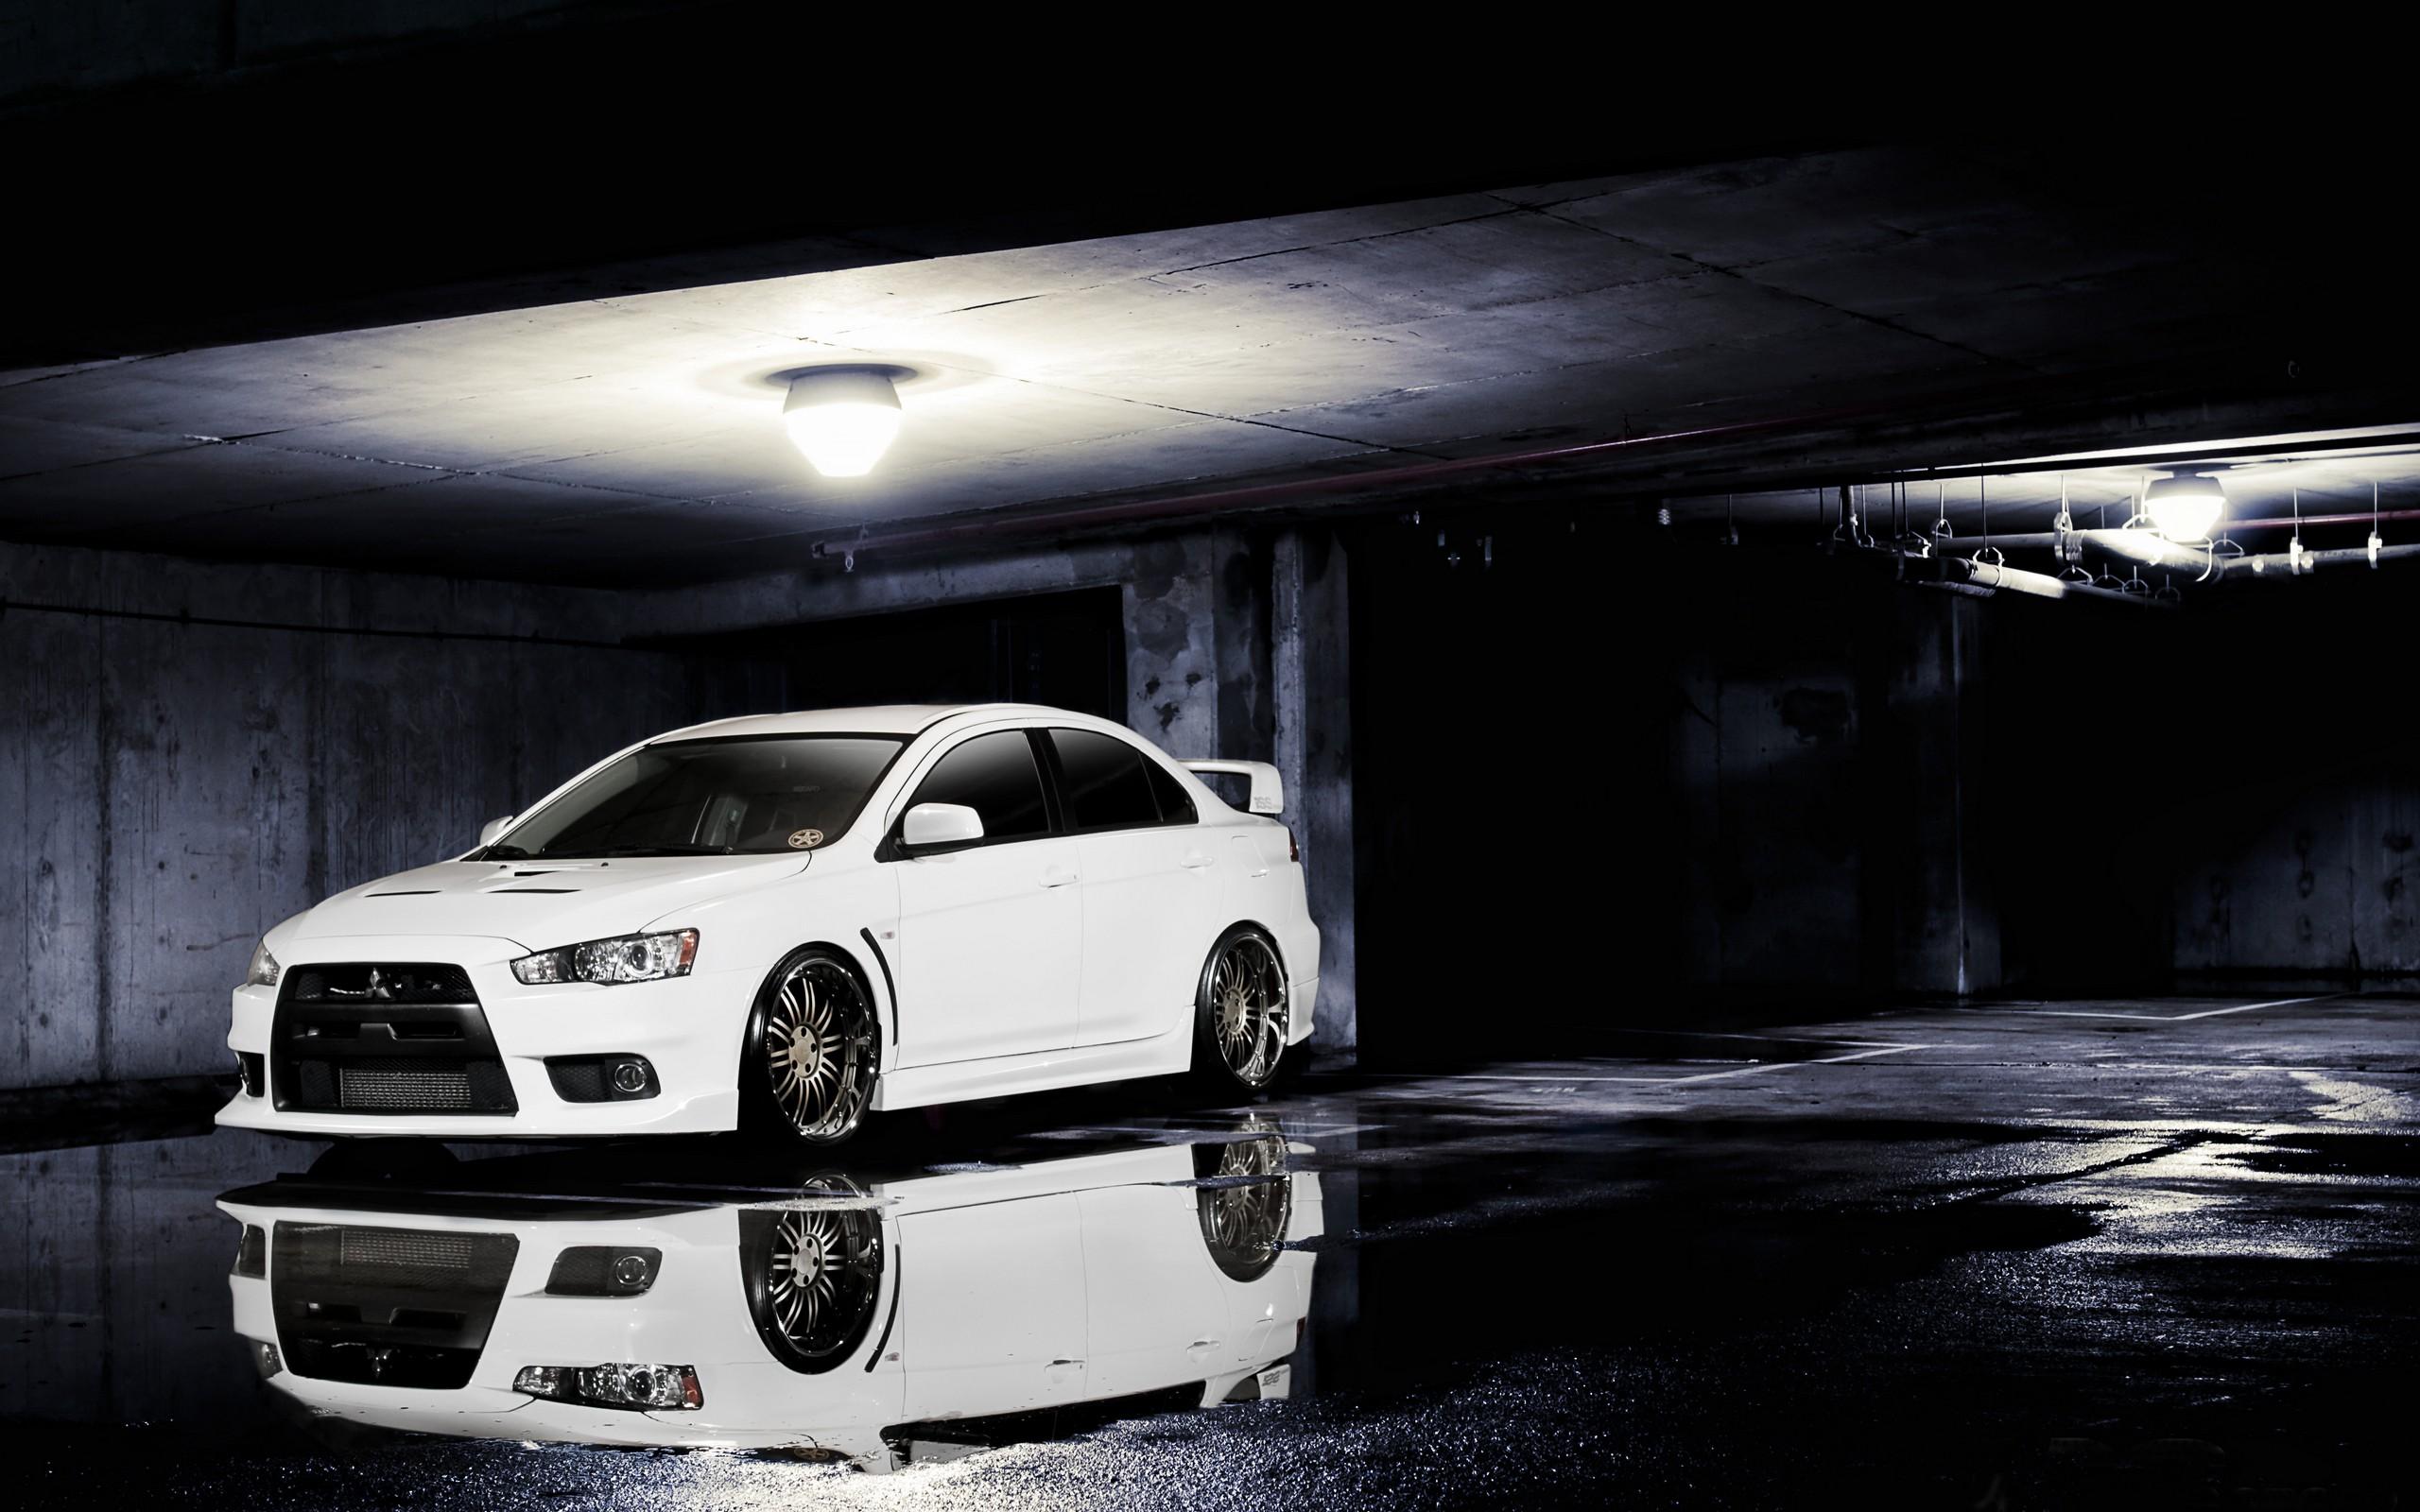 cars vehicles mitsubishi lancer evolution x wallpaper | 2560x1600